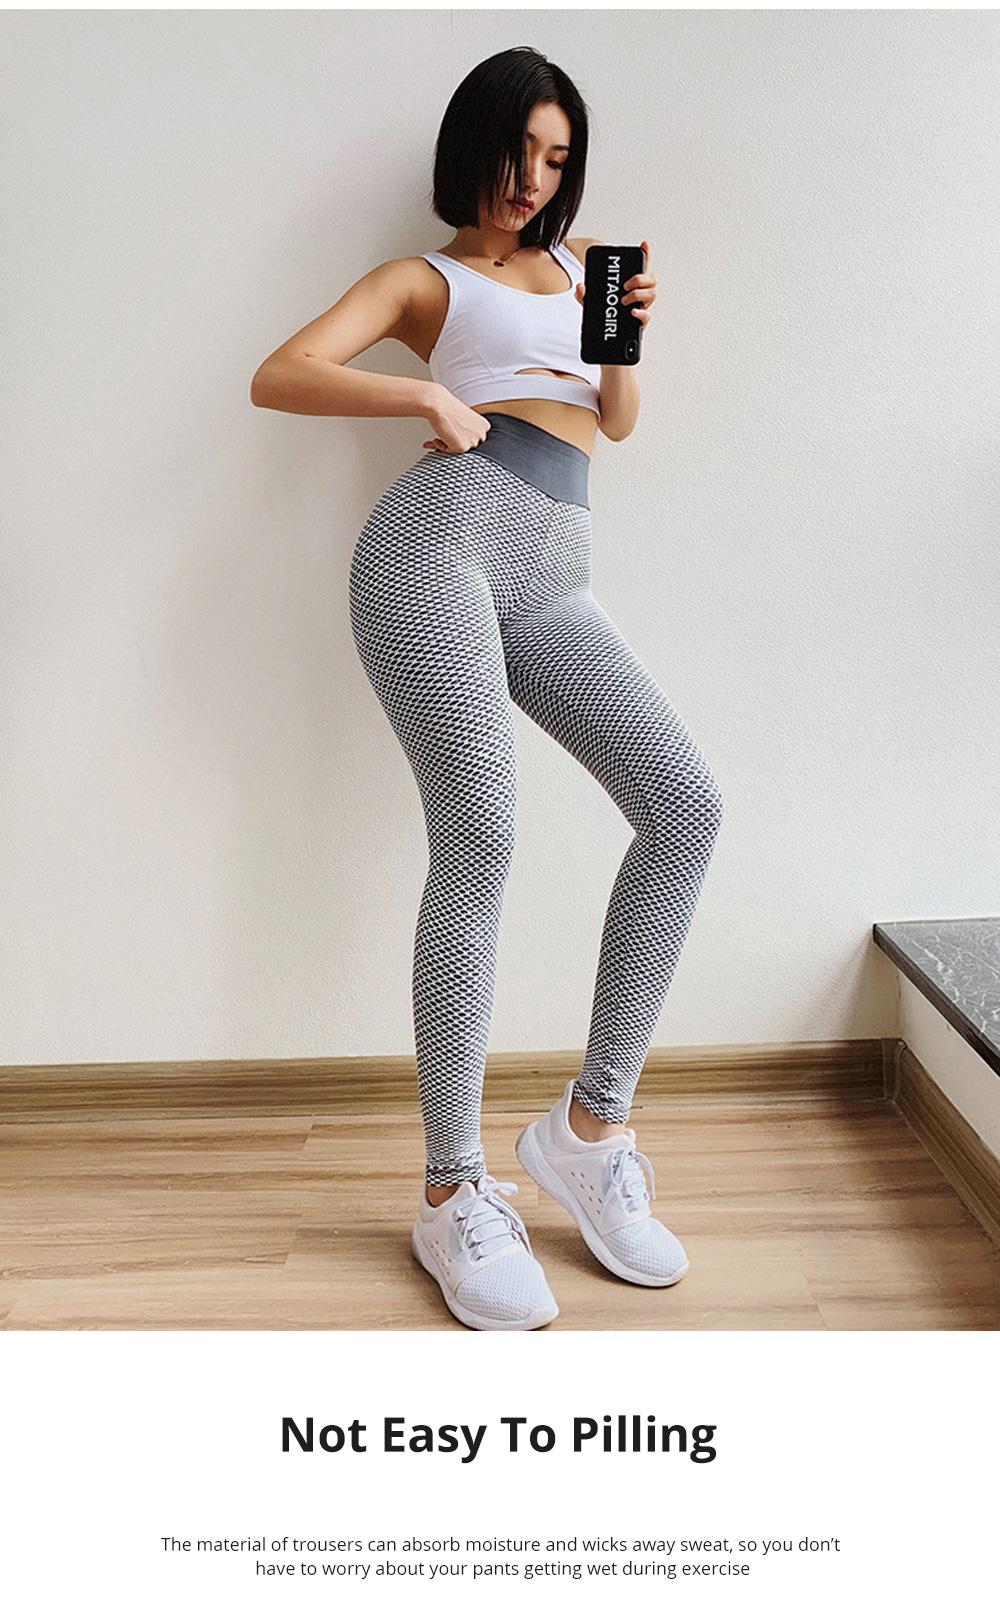 Women Wearing Tight Yoga Pants Fitness Seamless High Quality Workout Leggings High Waist Stretch Sports Yoga Pants 5